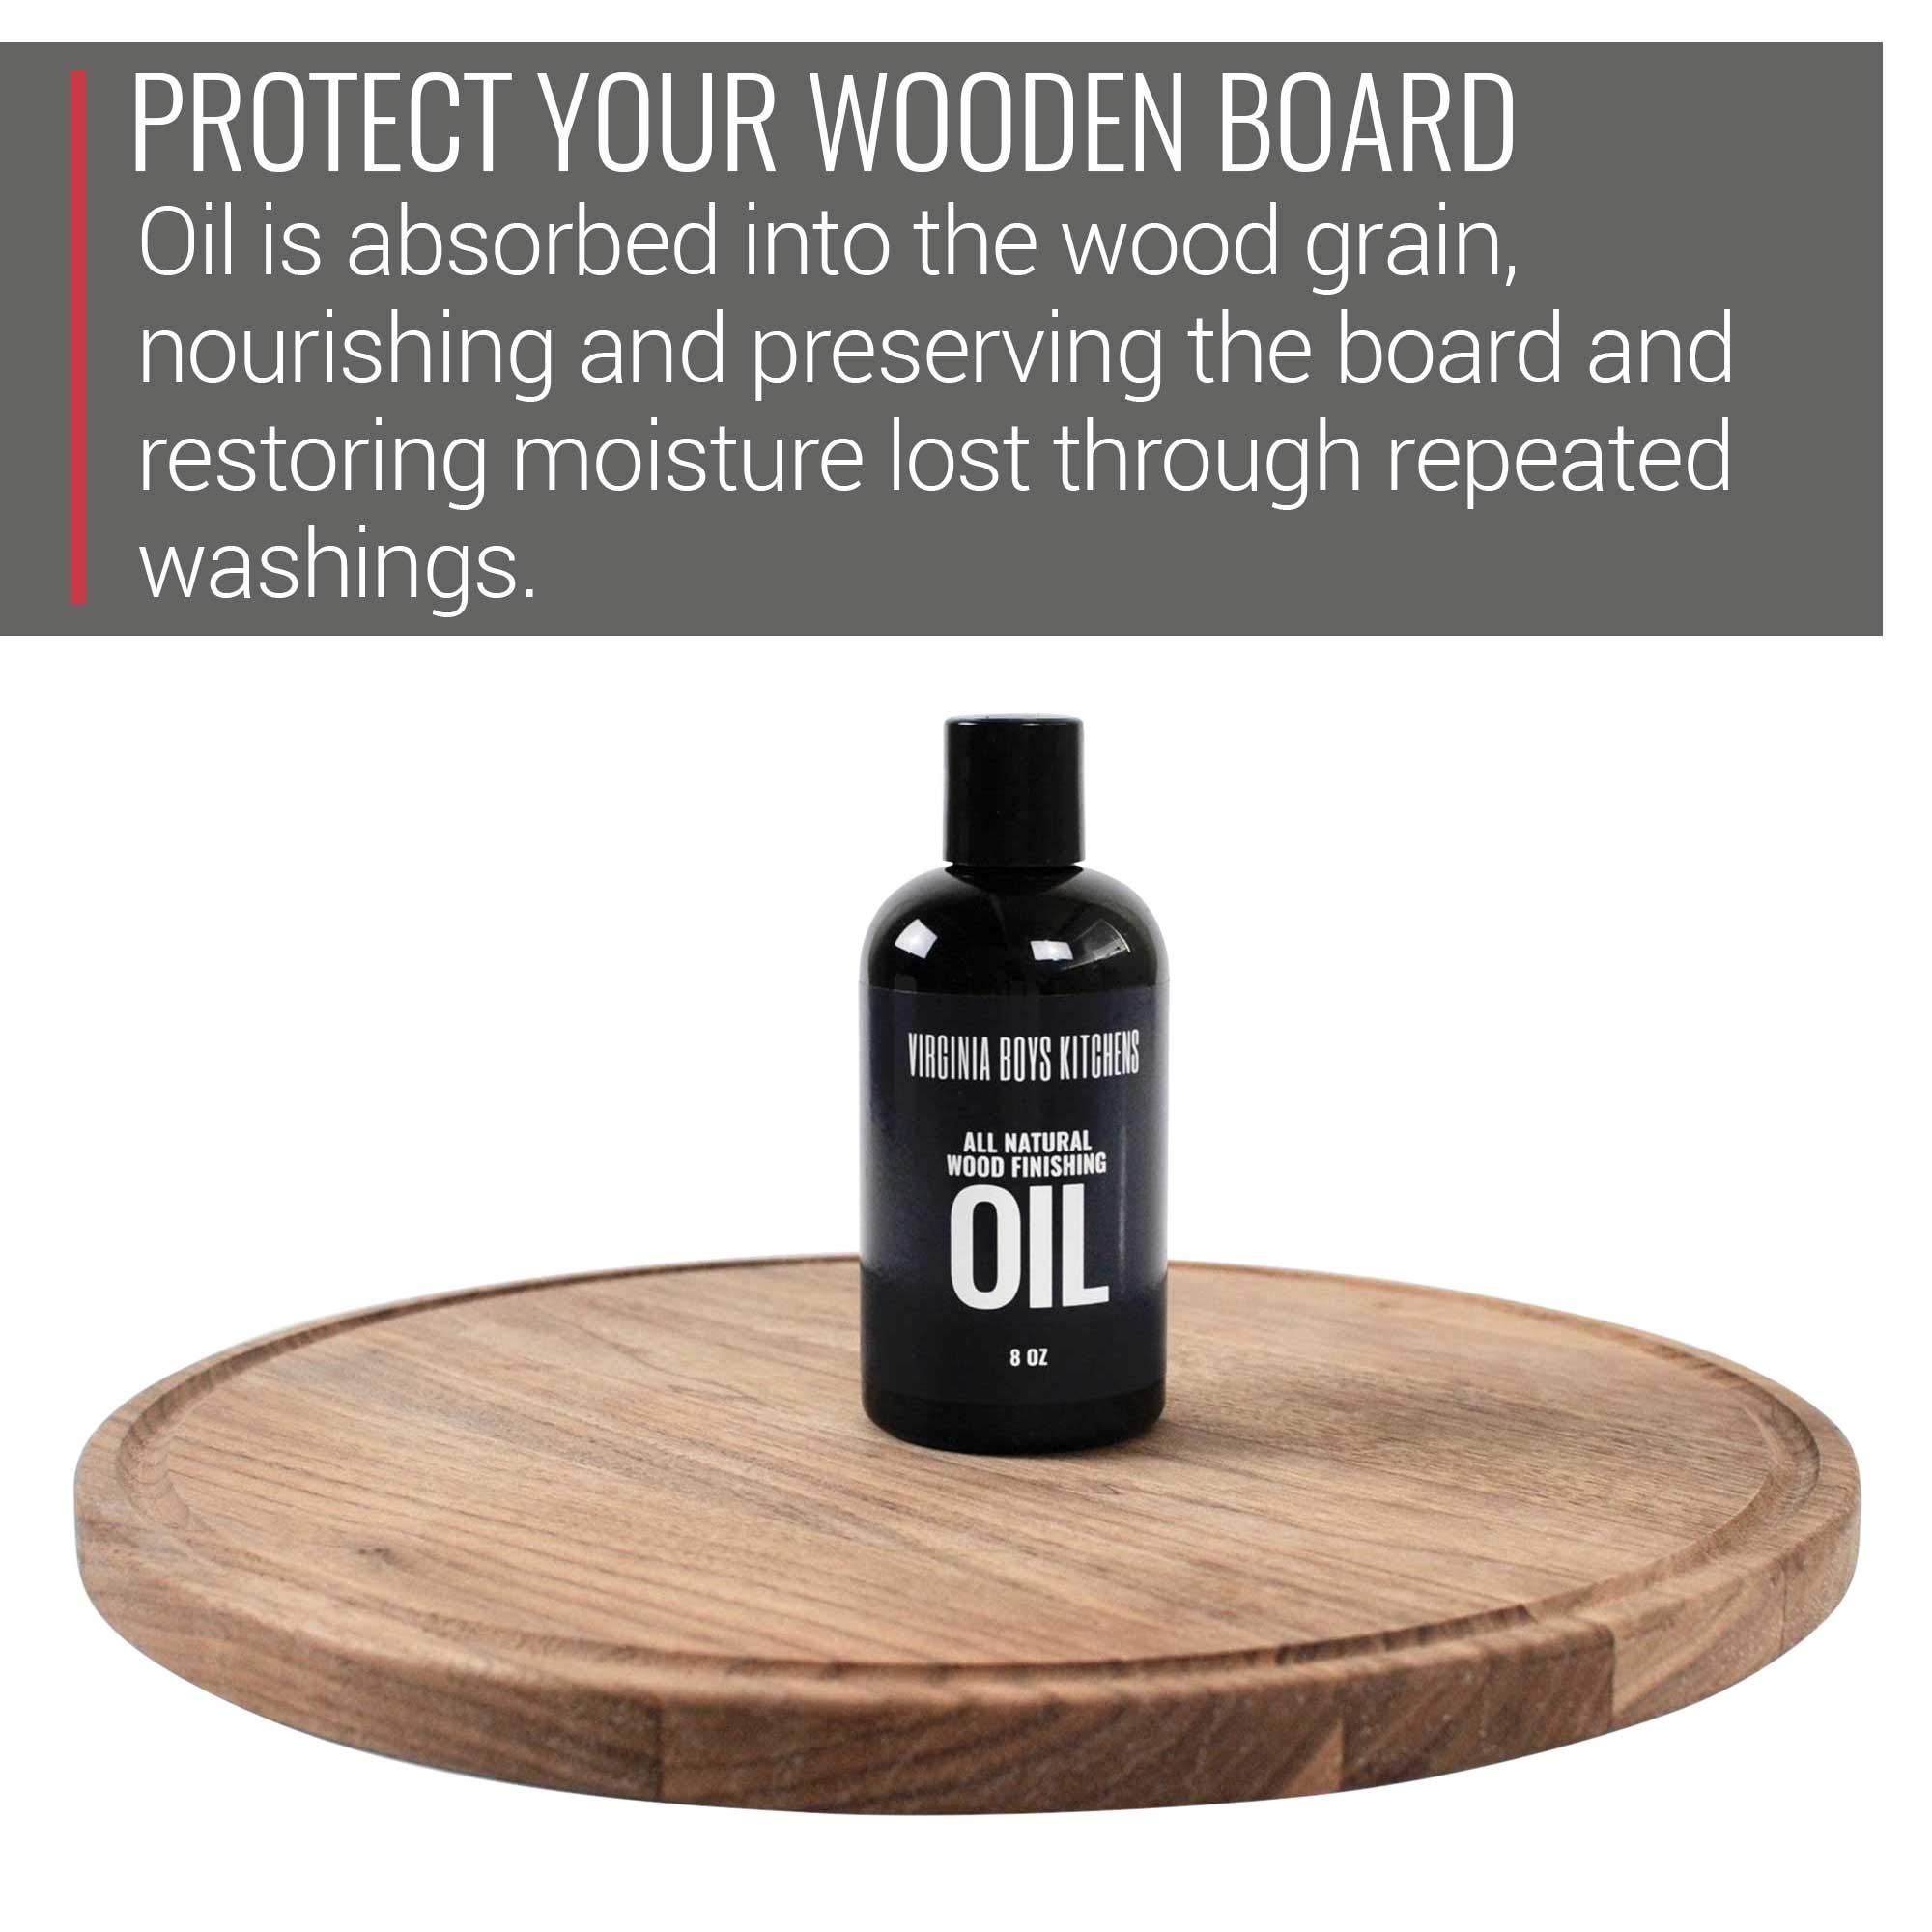 Virginia Boys Kitchens All Natural Wood Seasoning Oil (8 oz Bottle) by Virginia Boys Kitchens (Image #3)